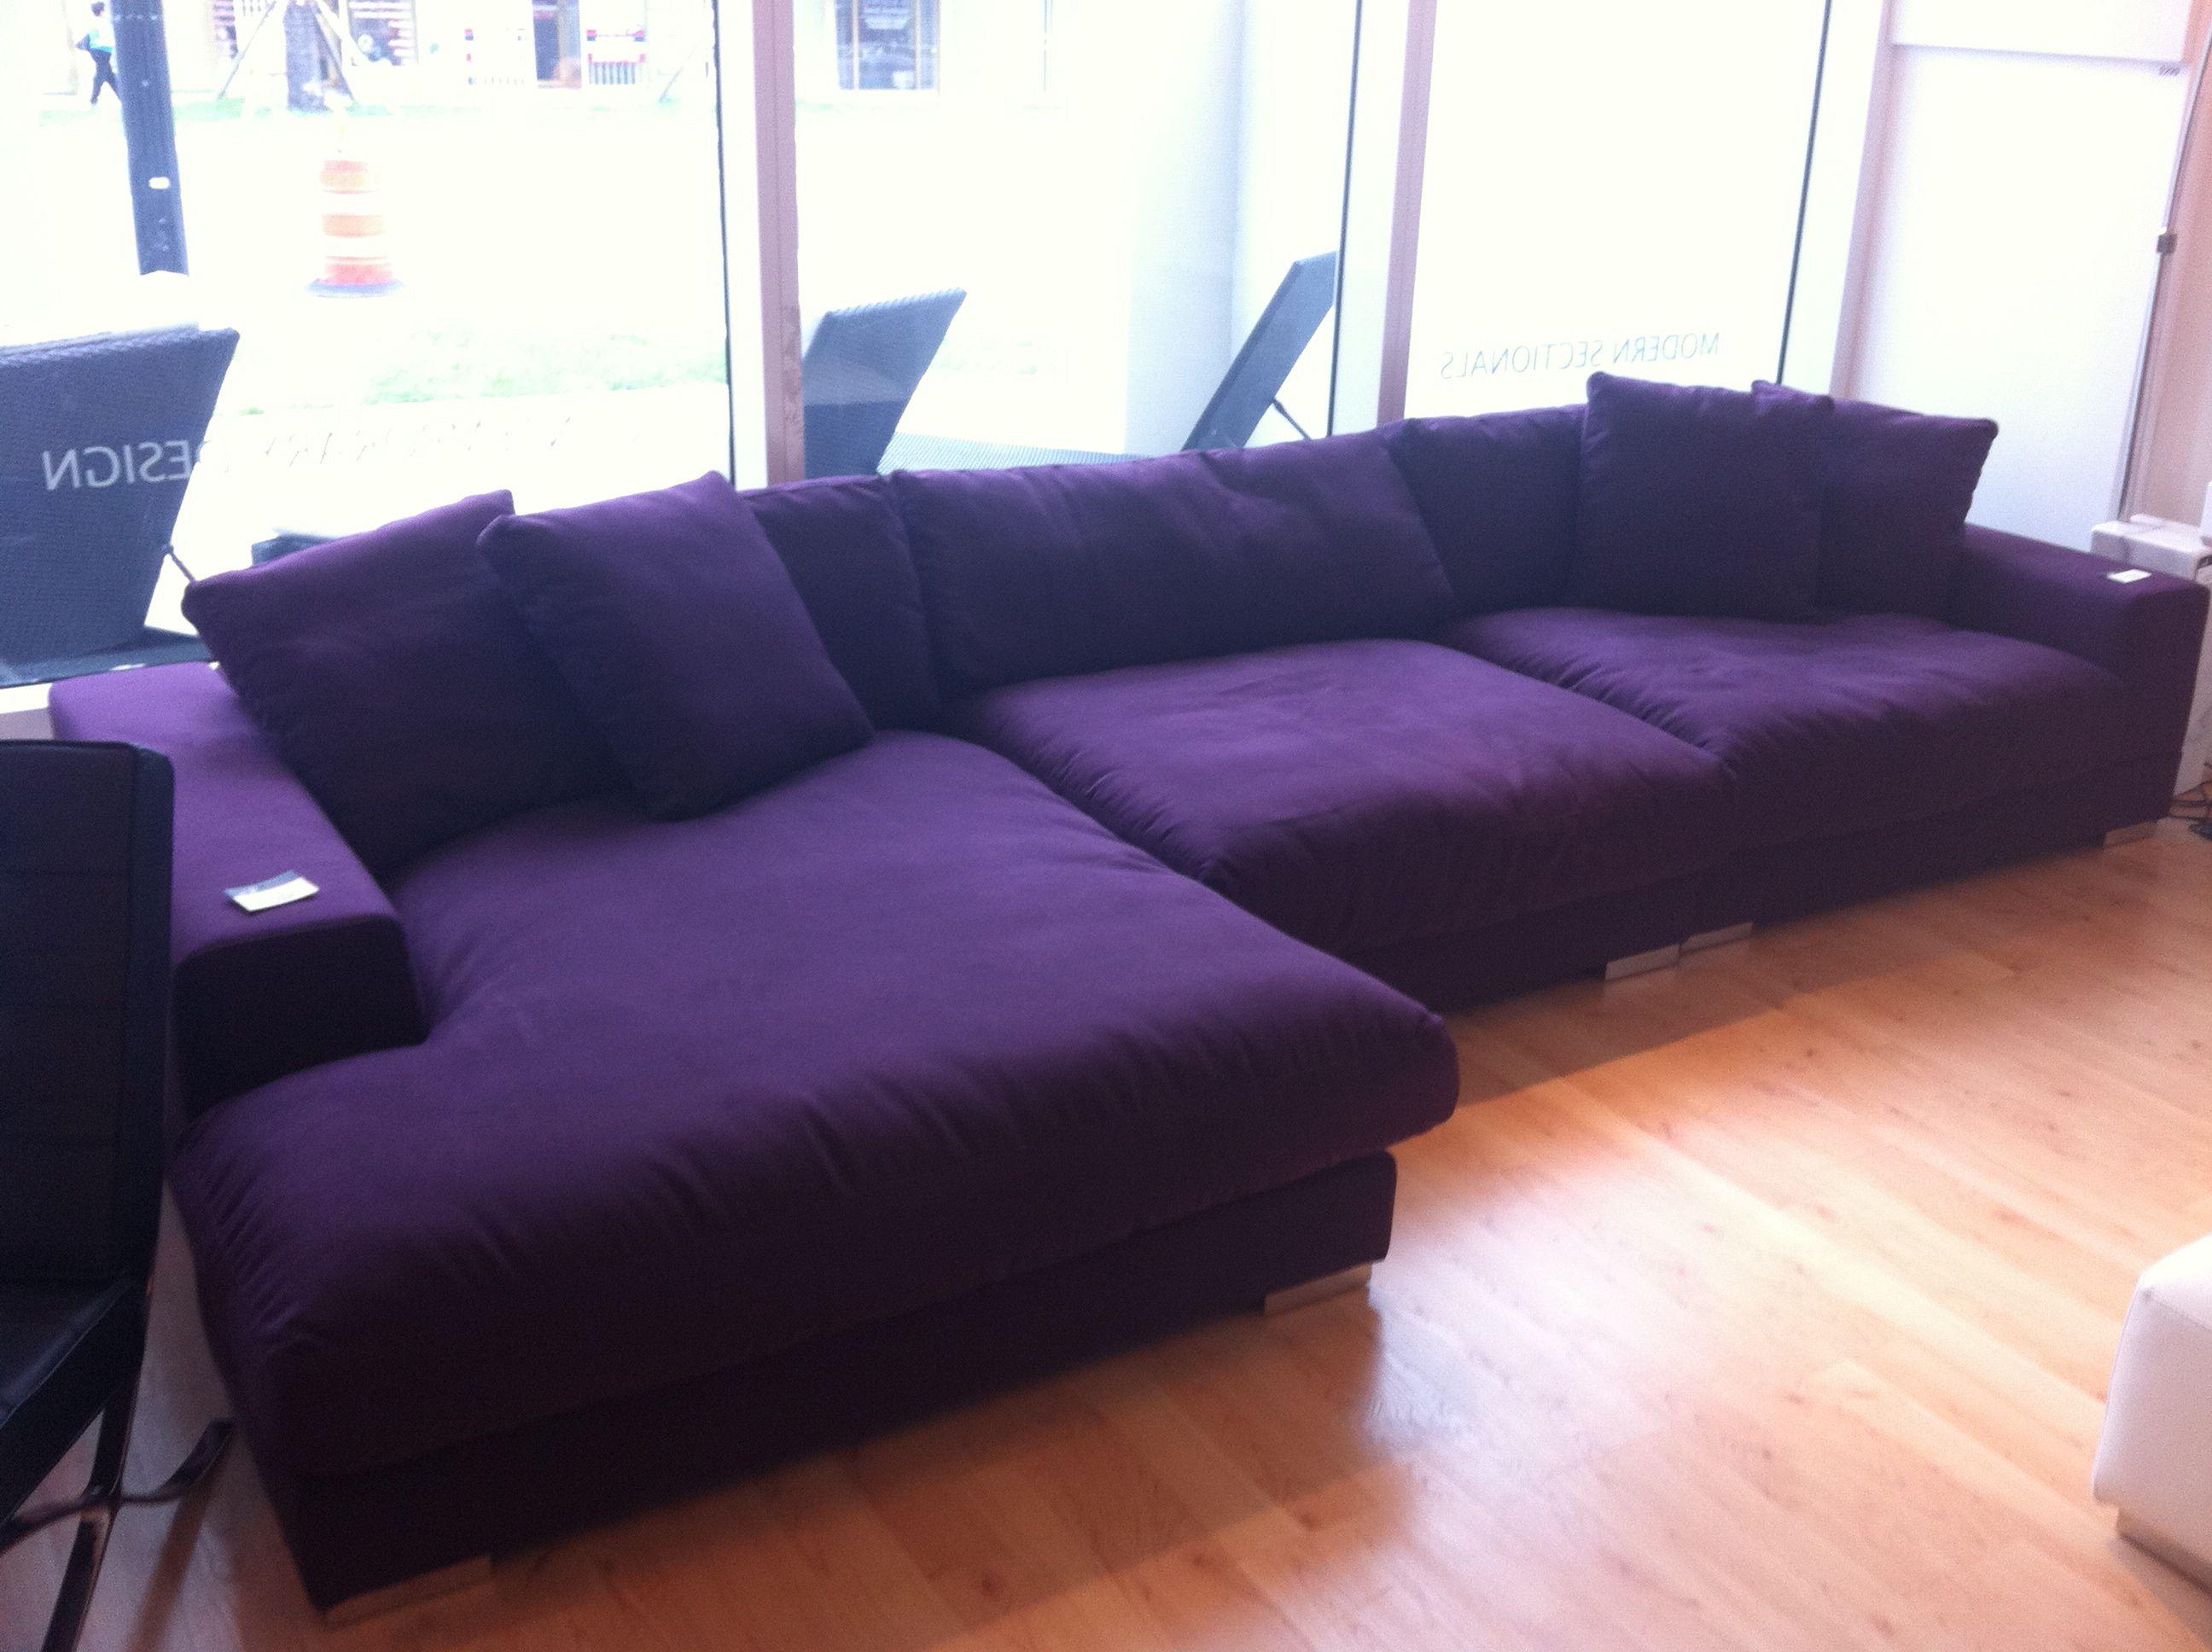 Best 25 Purple sofa design ideas on Pinterest